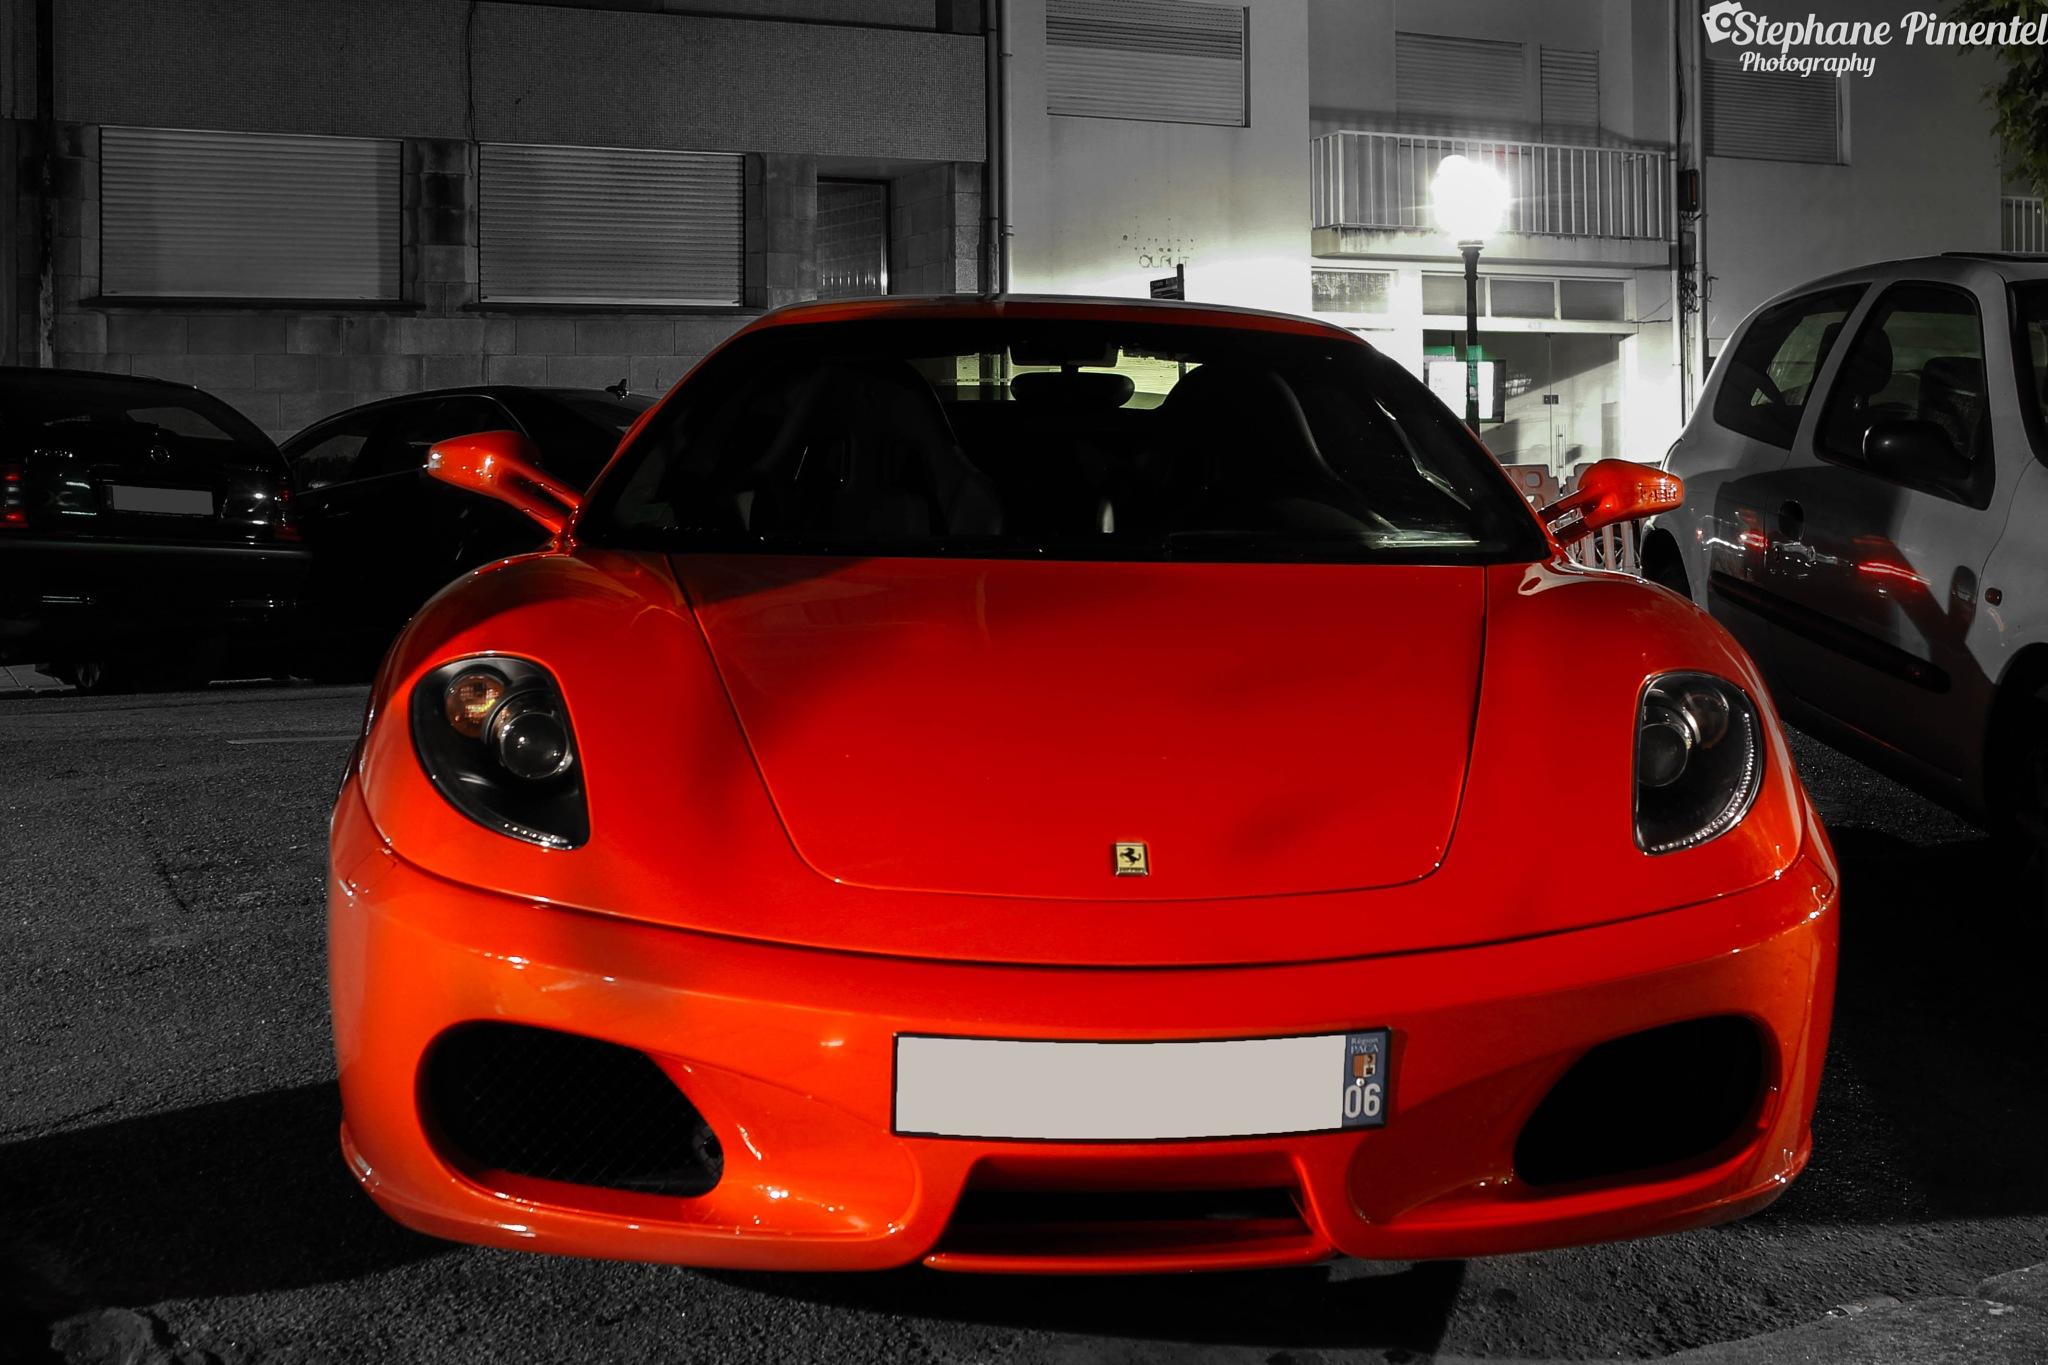 Ferrari F430 by Stephane Pimentel Photography